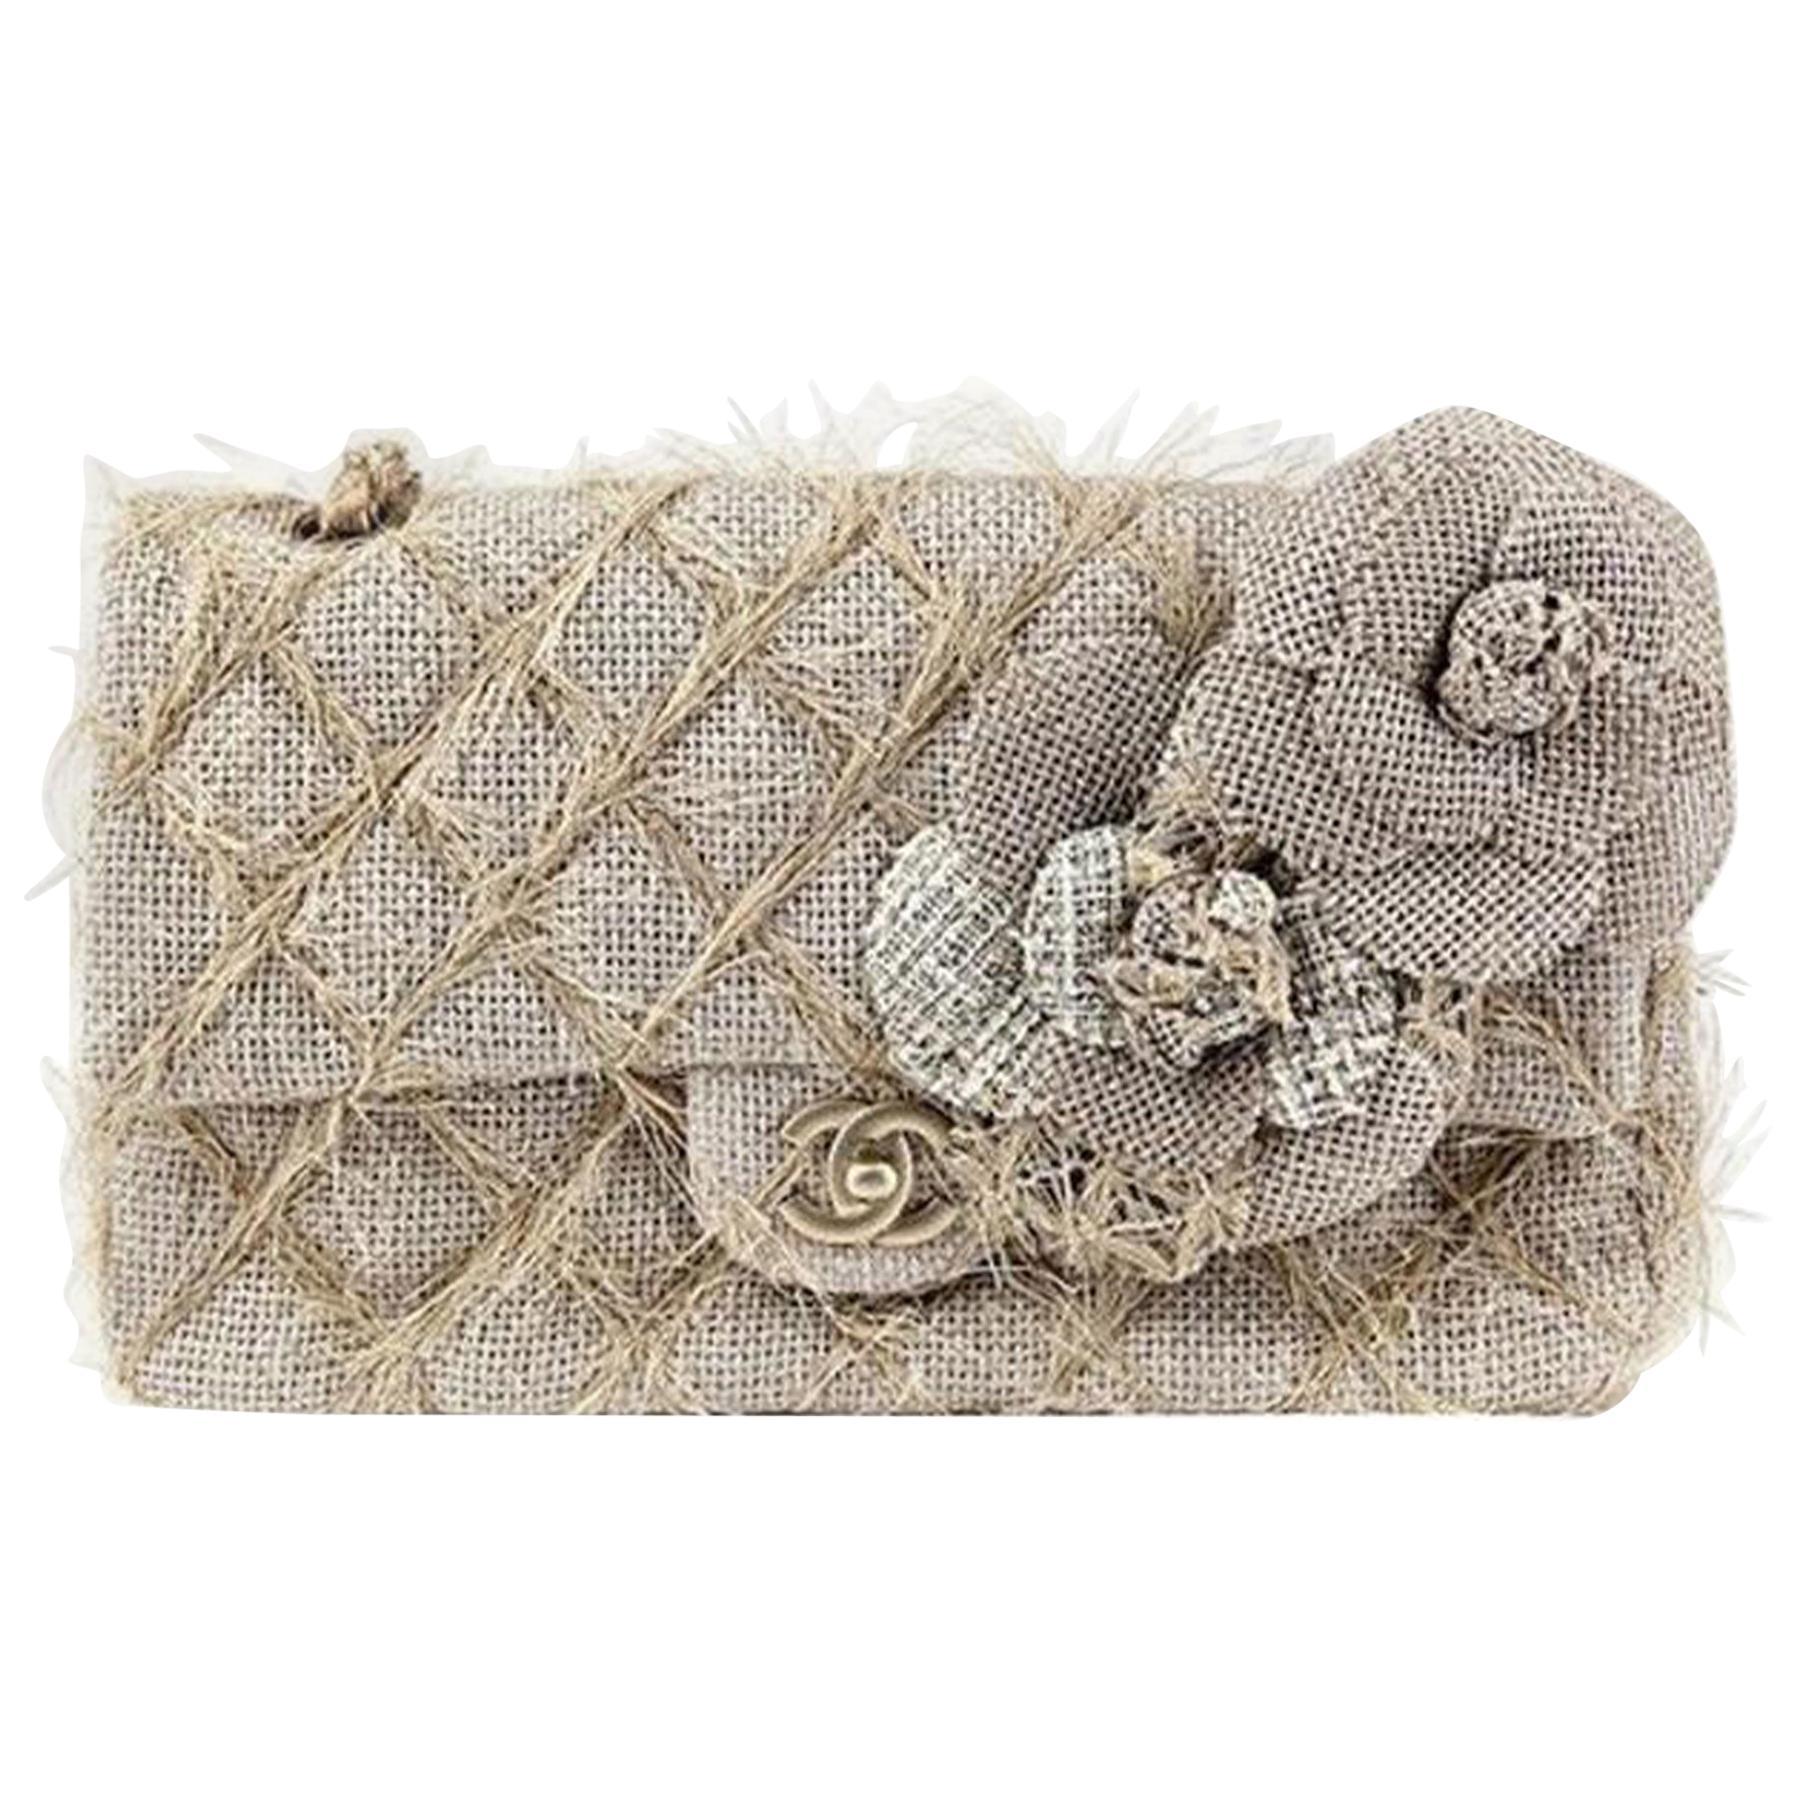 Chanel Classic Flap Straw Camelia Nude Beige Jute Raffia Tweed Rope Shoulder Bag